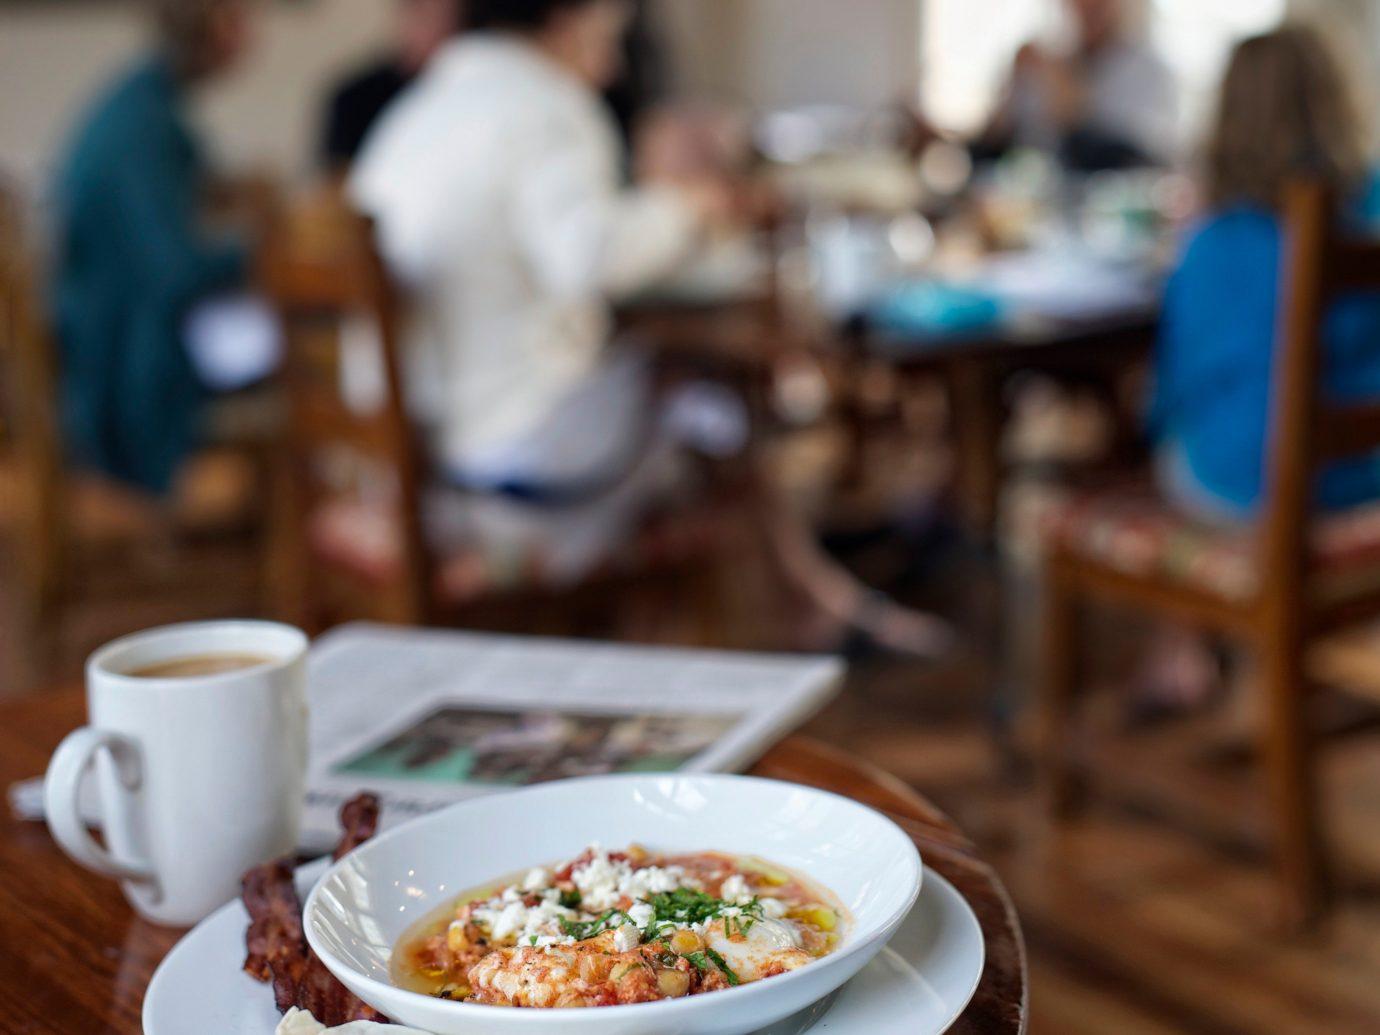 Hotels table food plate dish indoor meal lunch brunch breakfast restaurant supper sense cuisine dinner